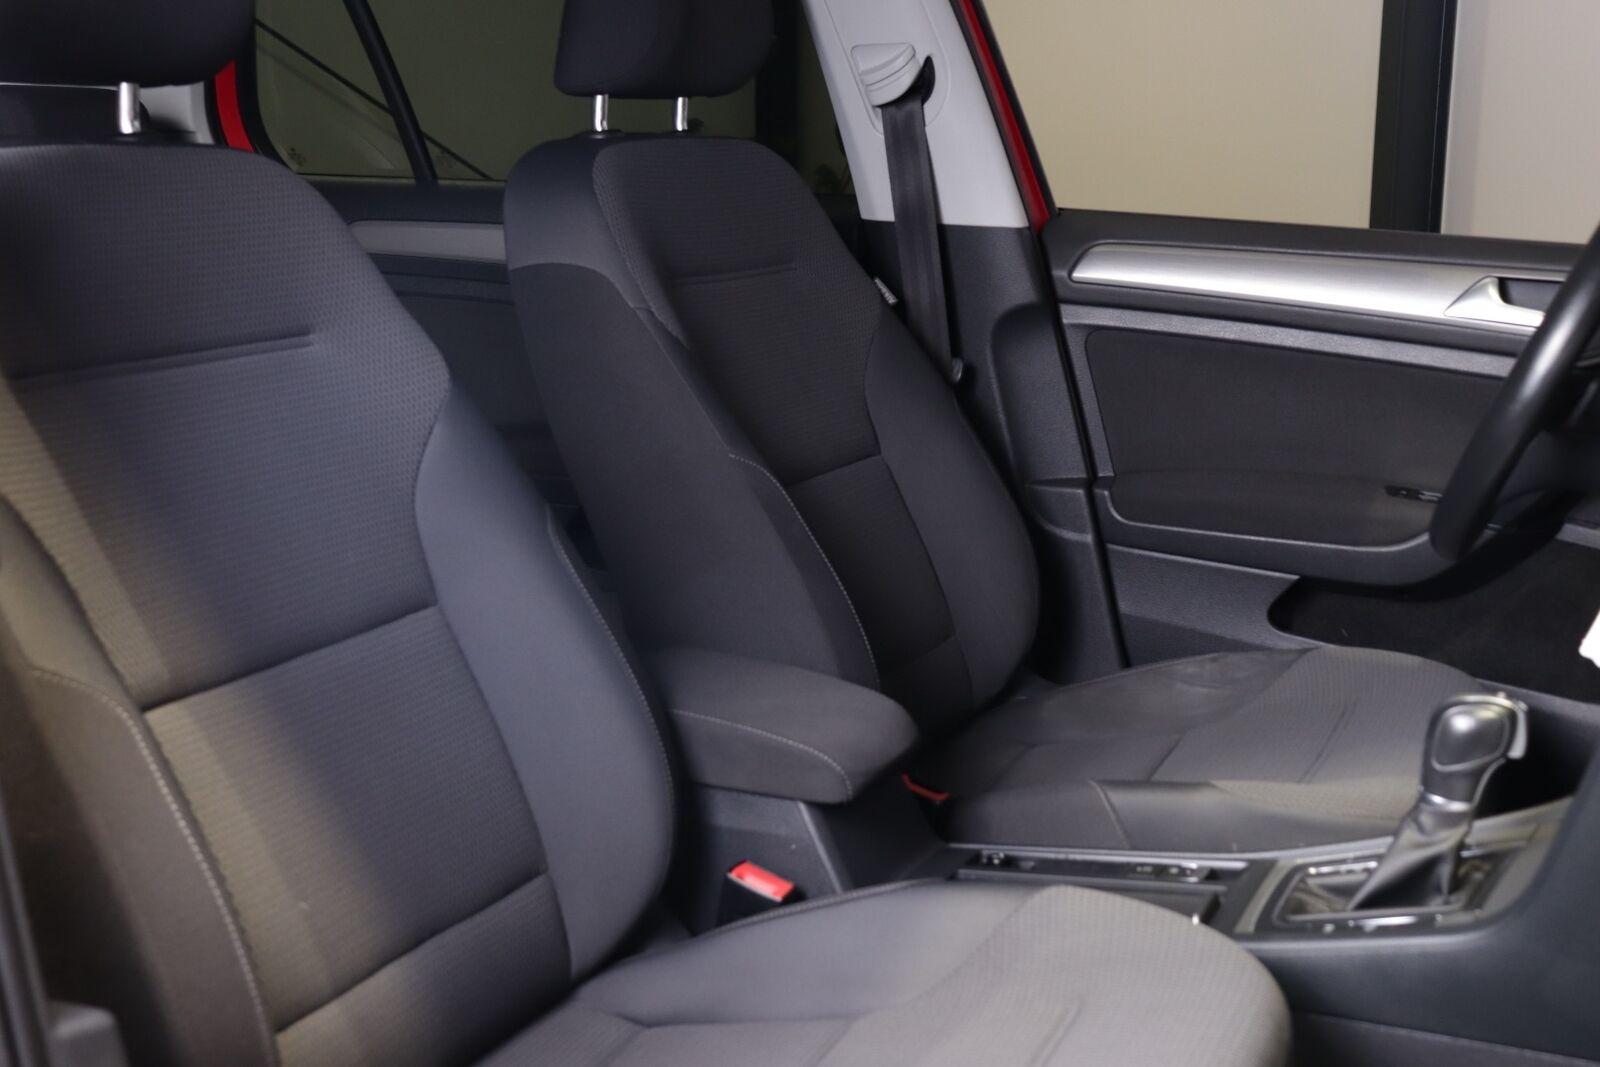 VW Golf VII TDi 105 Comfortline DSG BMT